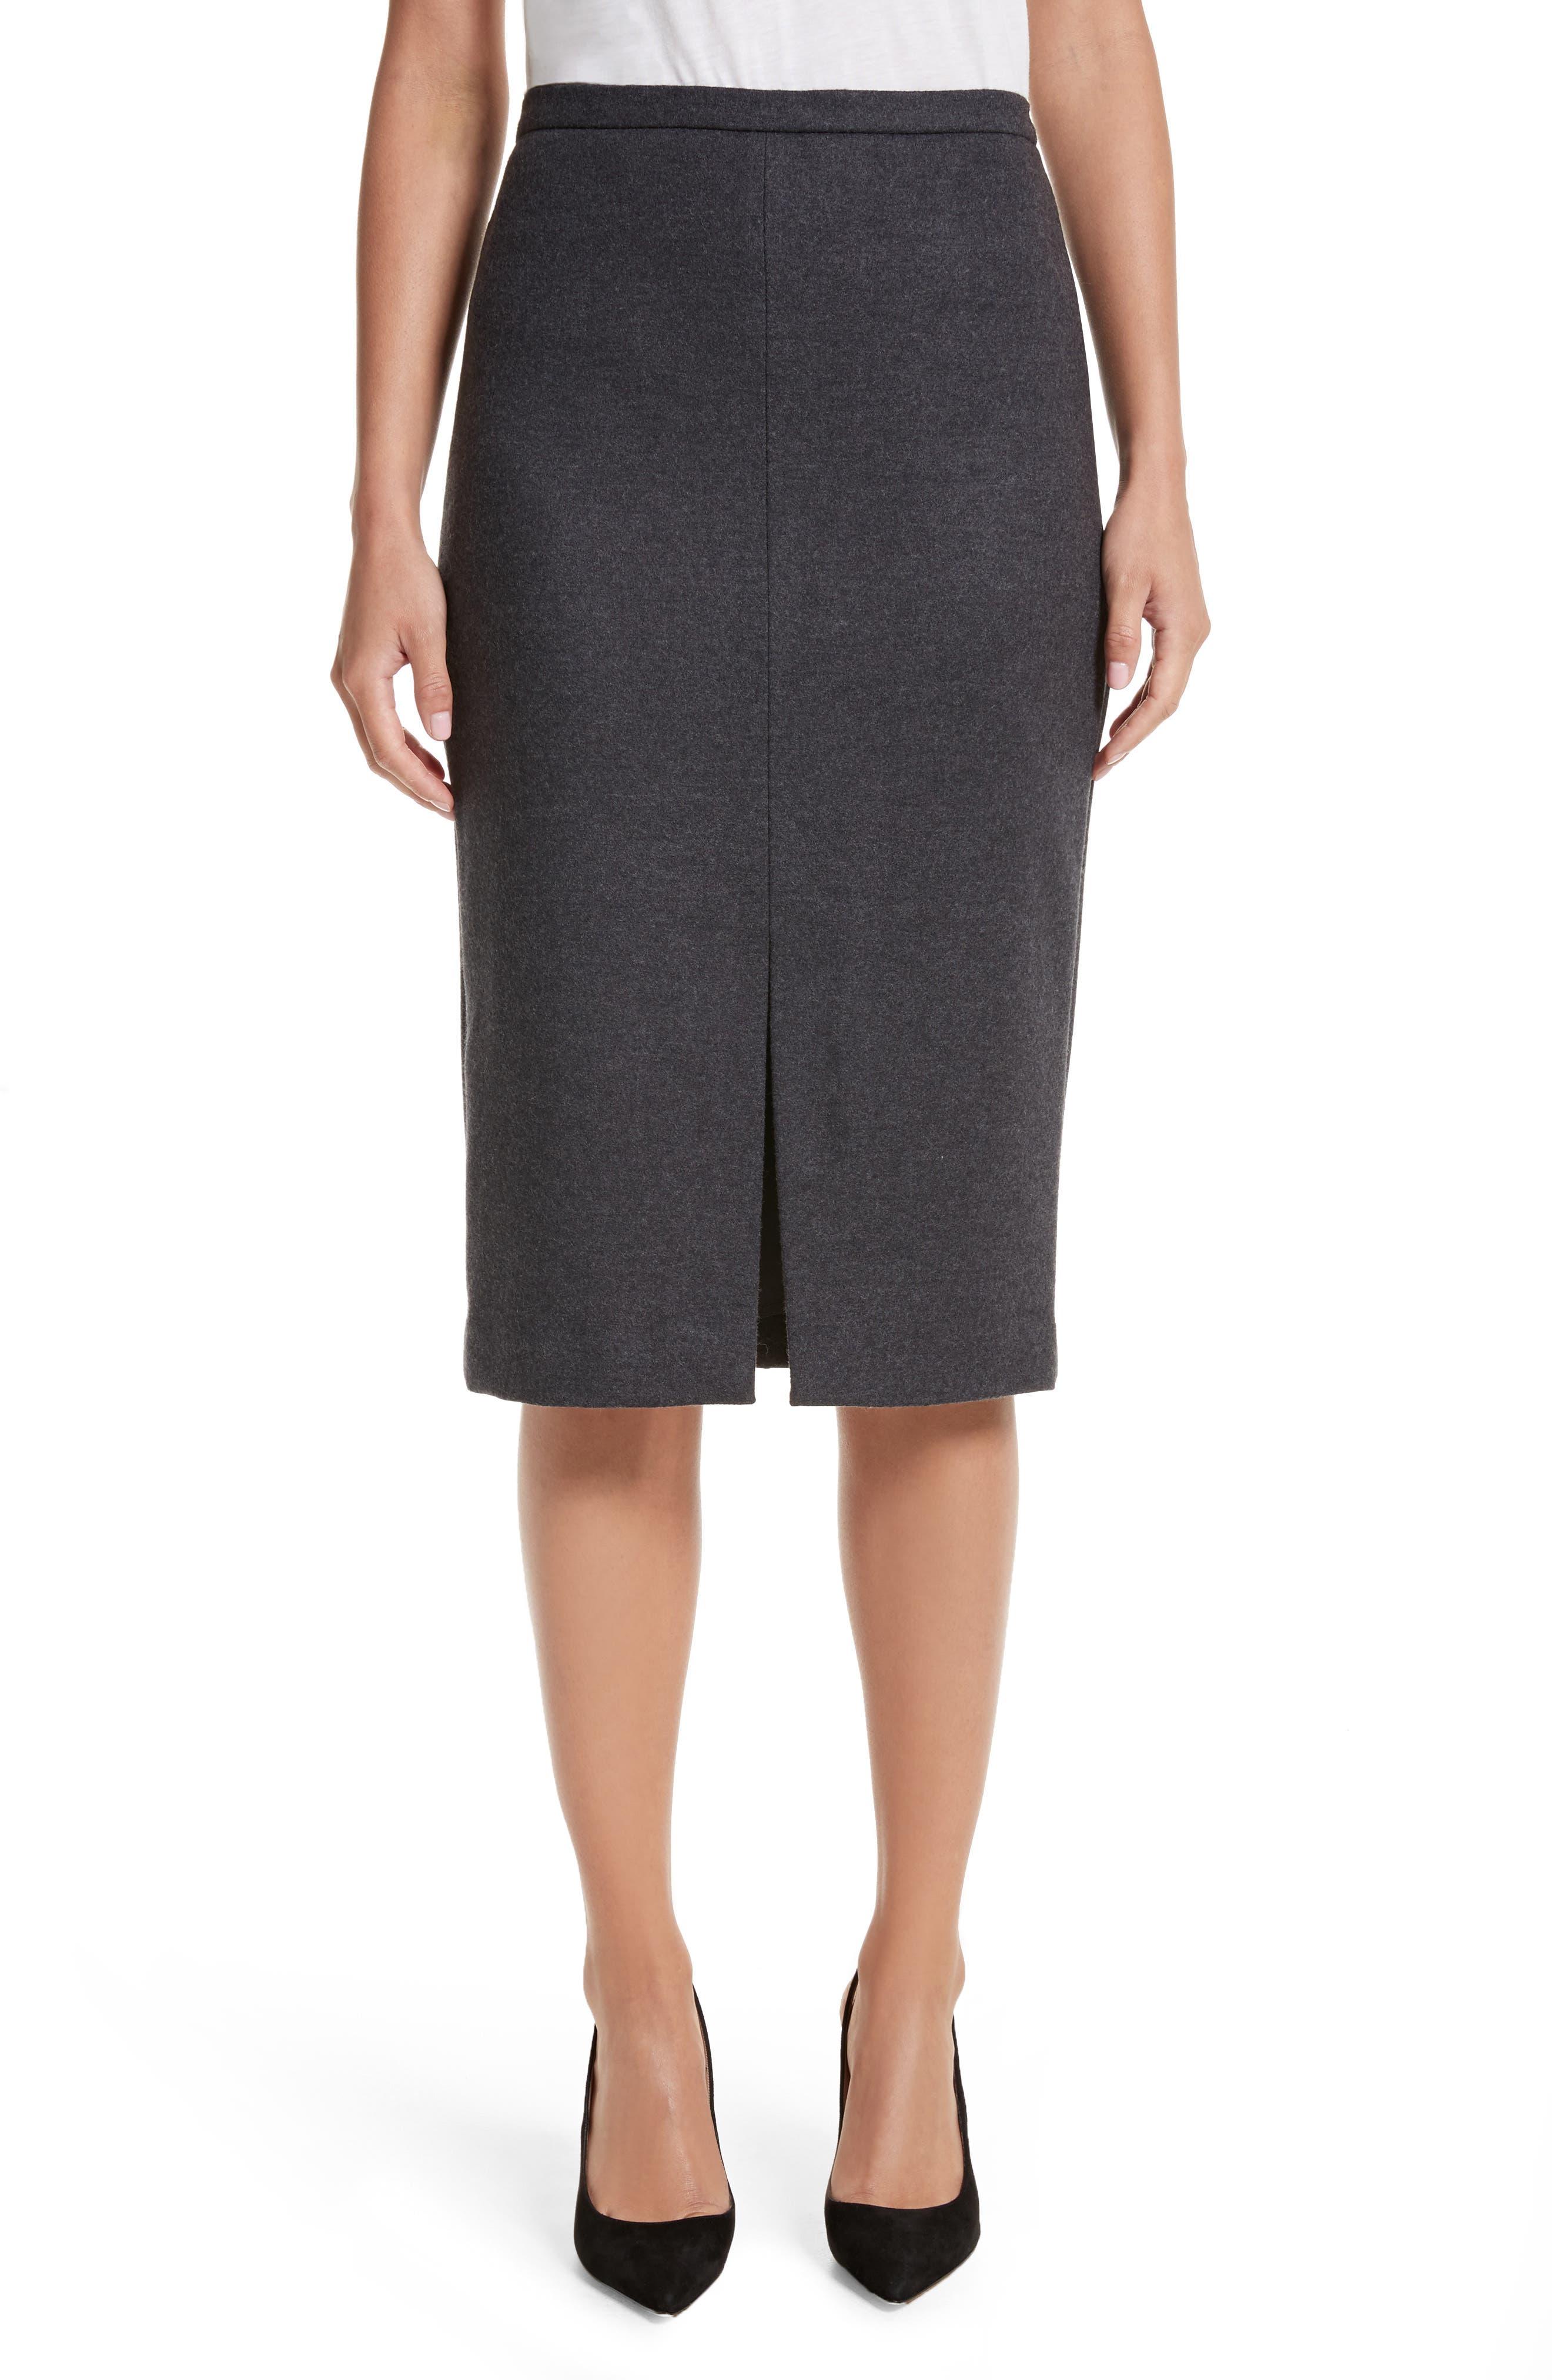 Main Image - Max Mara Nanna Leather Trim Wool Pencil Skirt